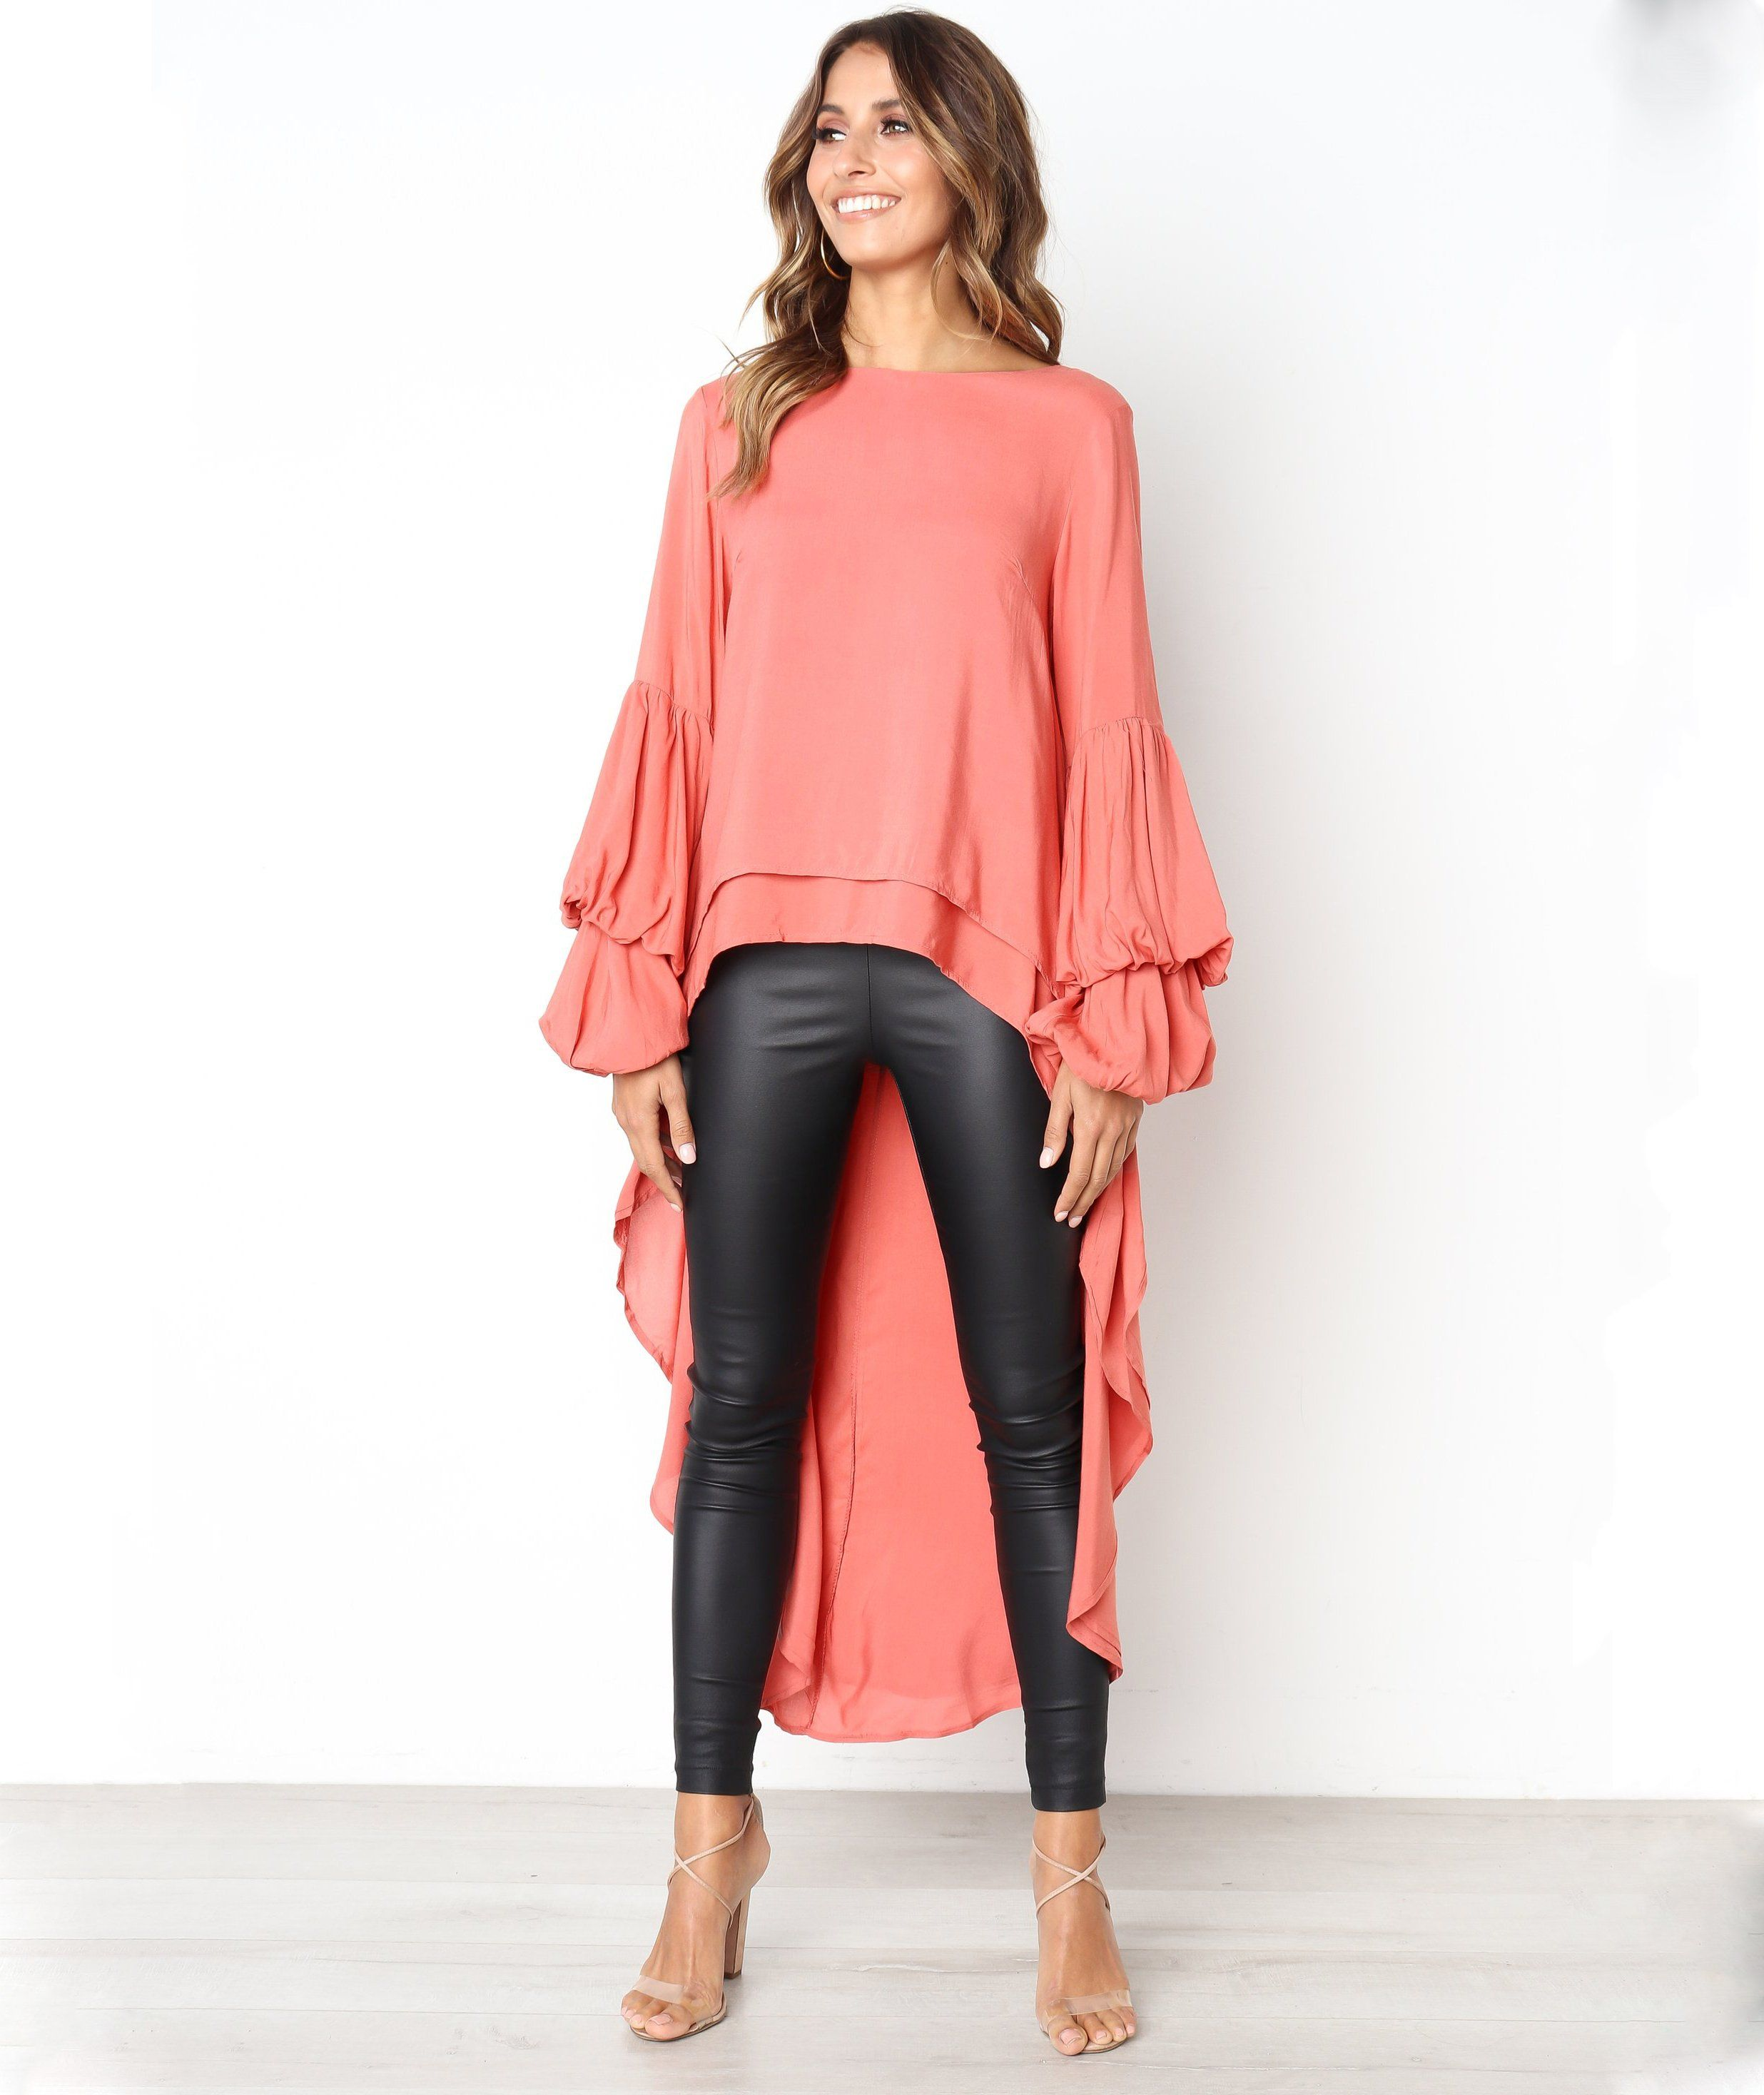 149c18fa539c Womens Puff Sleeve Baggy Asymmetric Chiffon Long Tops Blouse Ladies Solid  Shirts